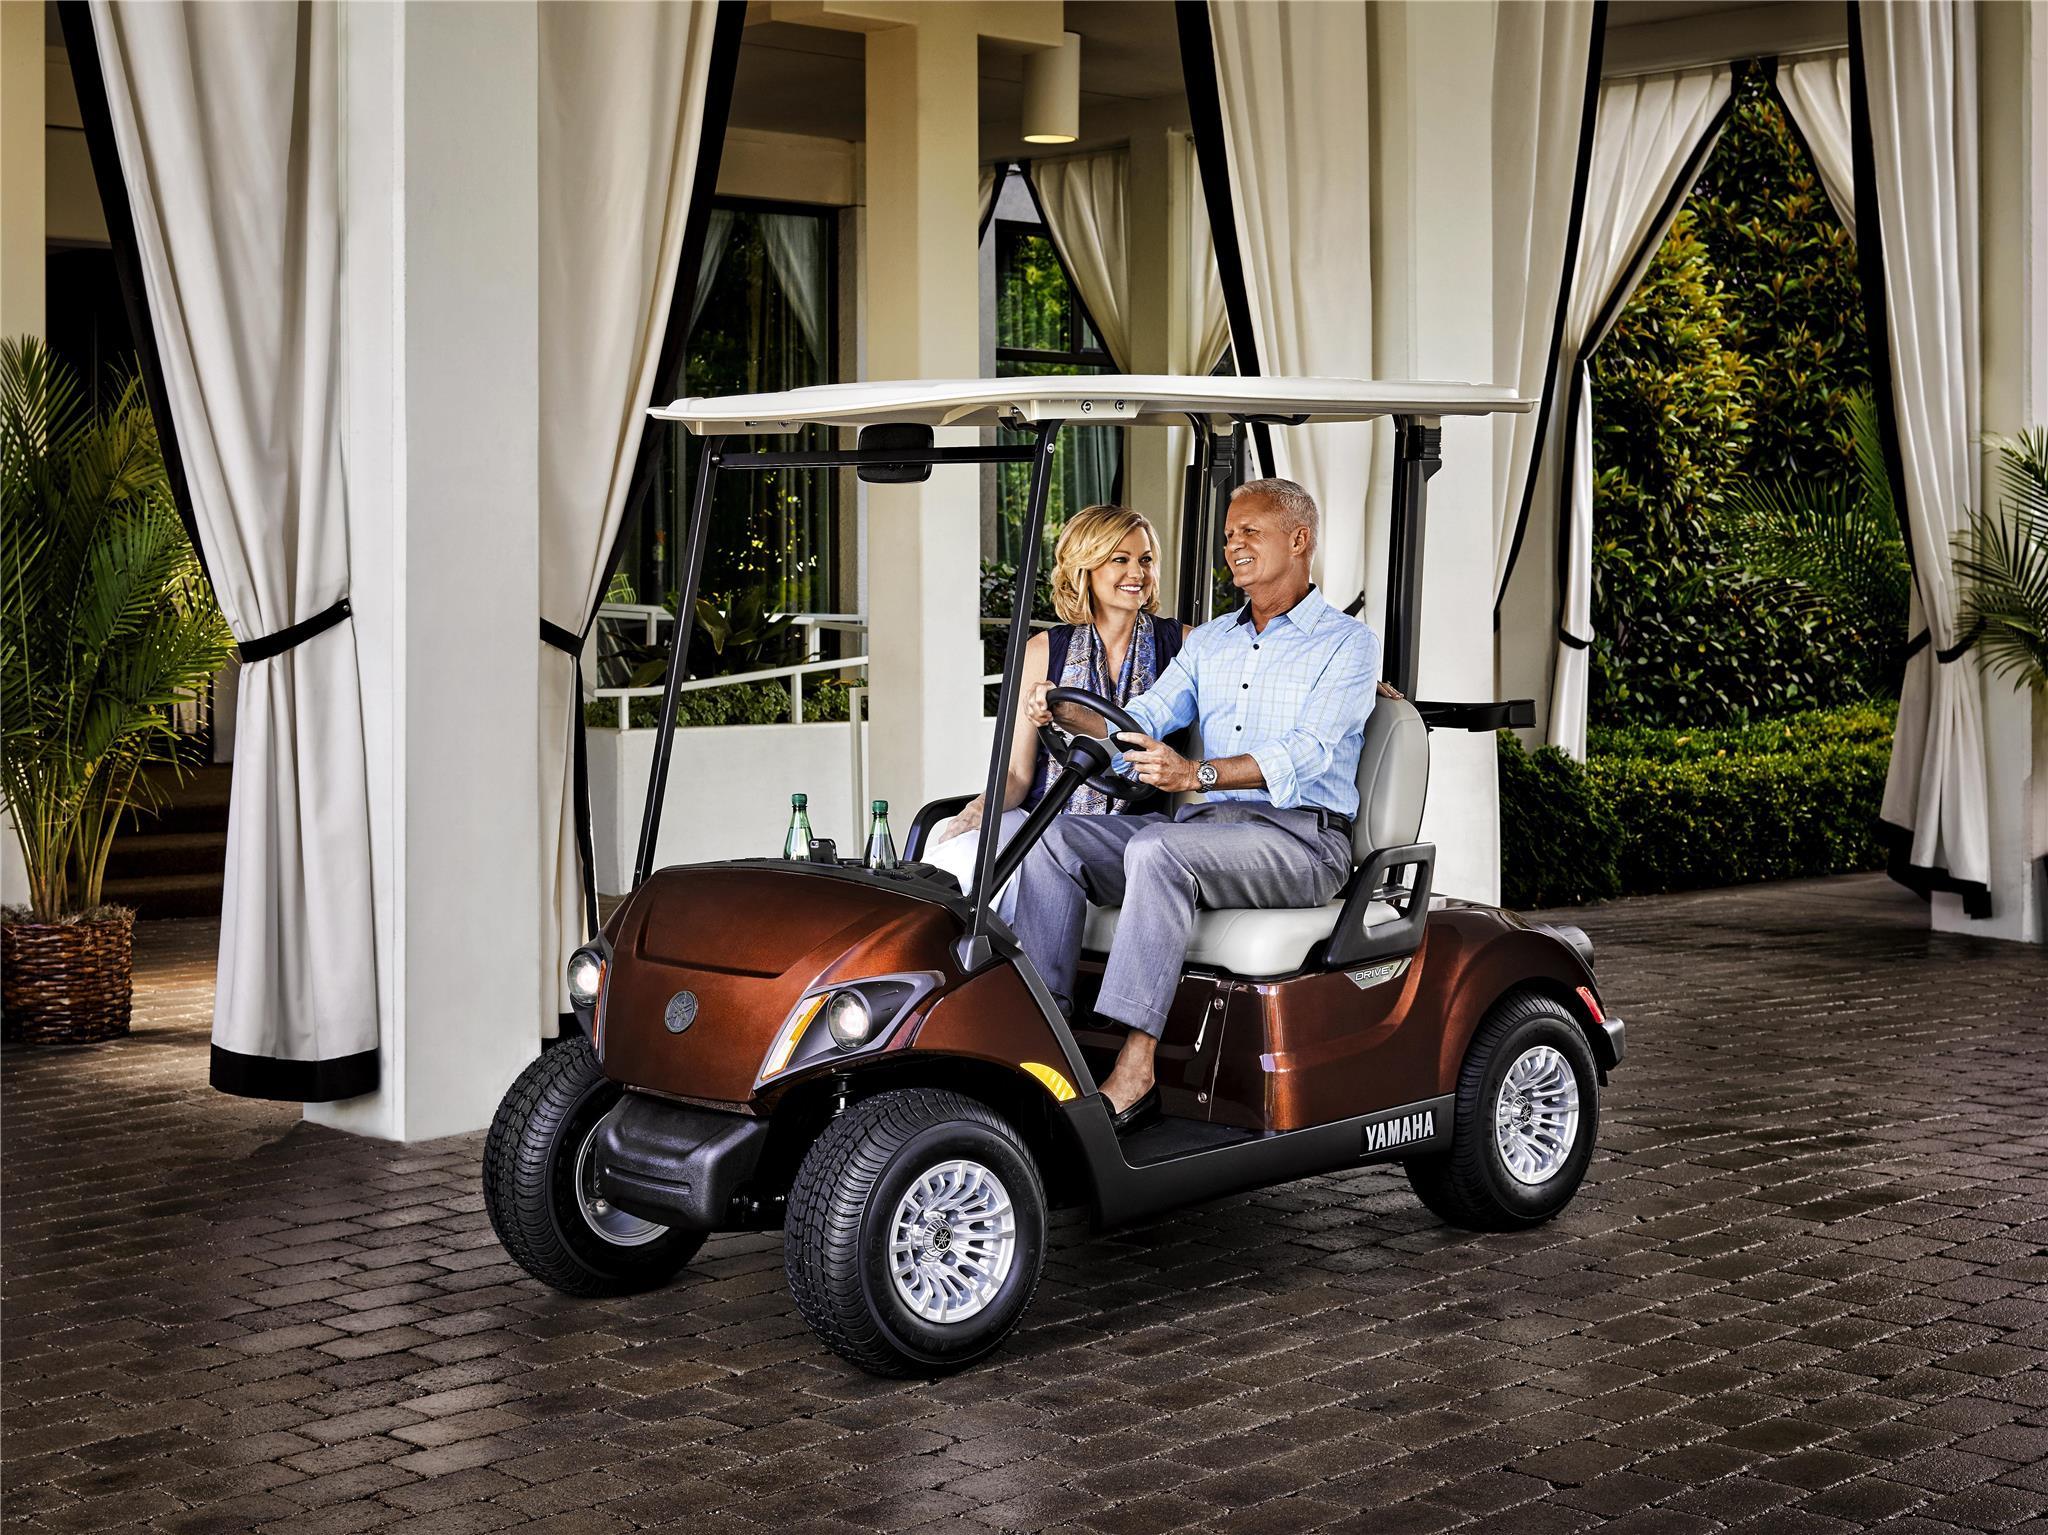 Golf Cart Lug Nut Types on golf cart traction bars, golf cart hubs, golf cart wheel covers, golf cart races, golf cart ignition, golf cart rims, golf cart wheel adapters, golf cart brake shoes, golf cart electronics, golf cart spinners, golf cart spindles, golf cart axles, golf cart bolts, golf cart horns, golf cart shocks, golf cart cooling system, golf cart tie rods, golf cart hood, golf cart struts, golf cart wheel locks,